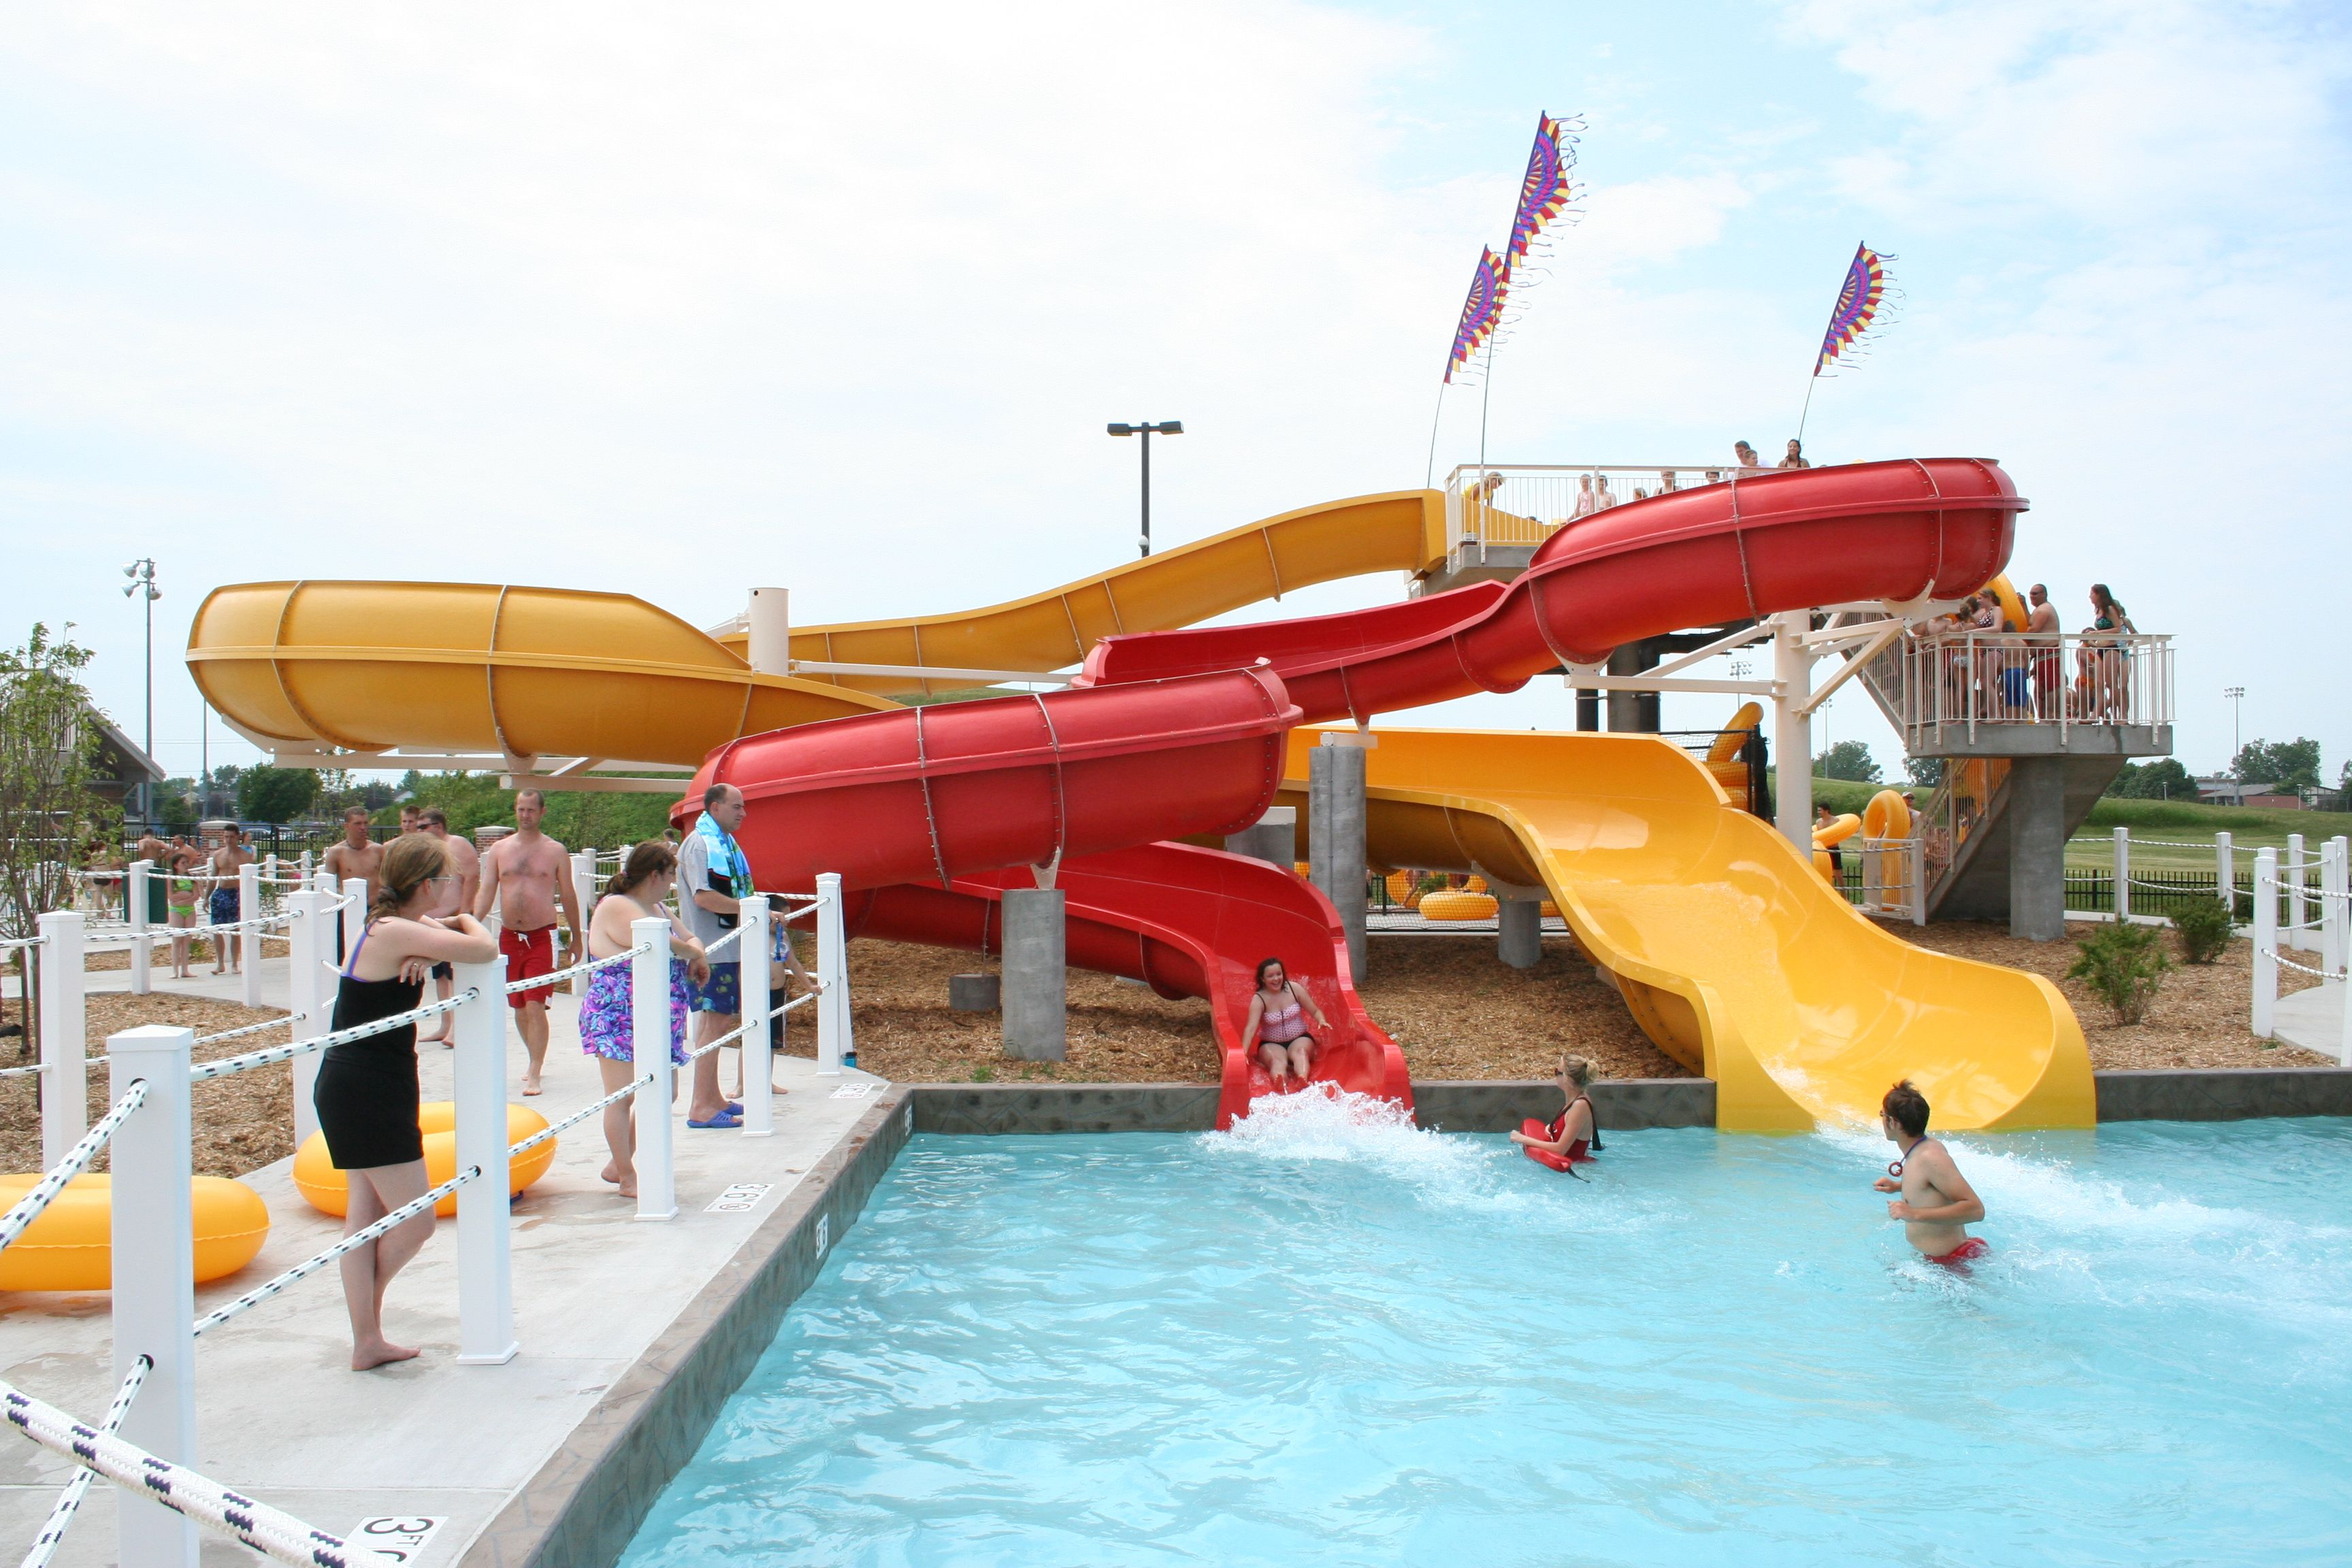 Hot Tub Covers Oshkosh >> Water slide fun! Oshkosh, WI. | Family Fun in Oshkosh | Pinterest | Water slides, Water parks ...